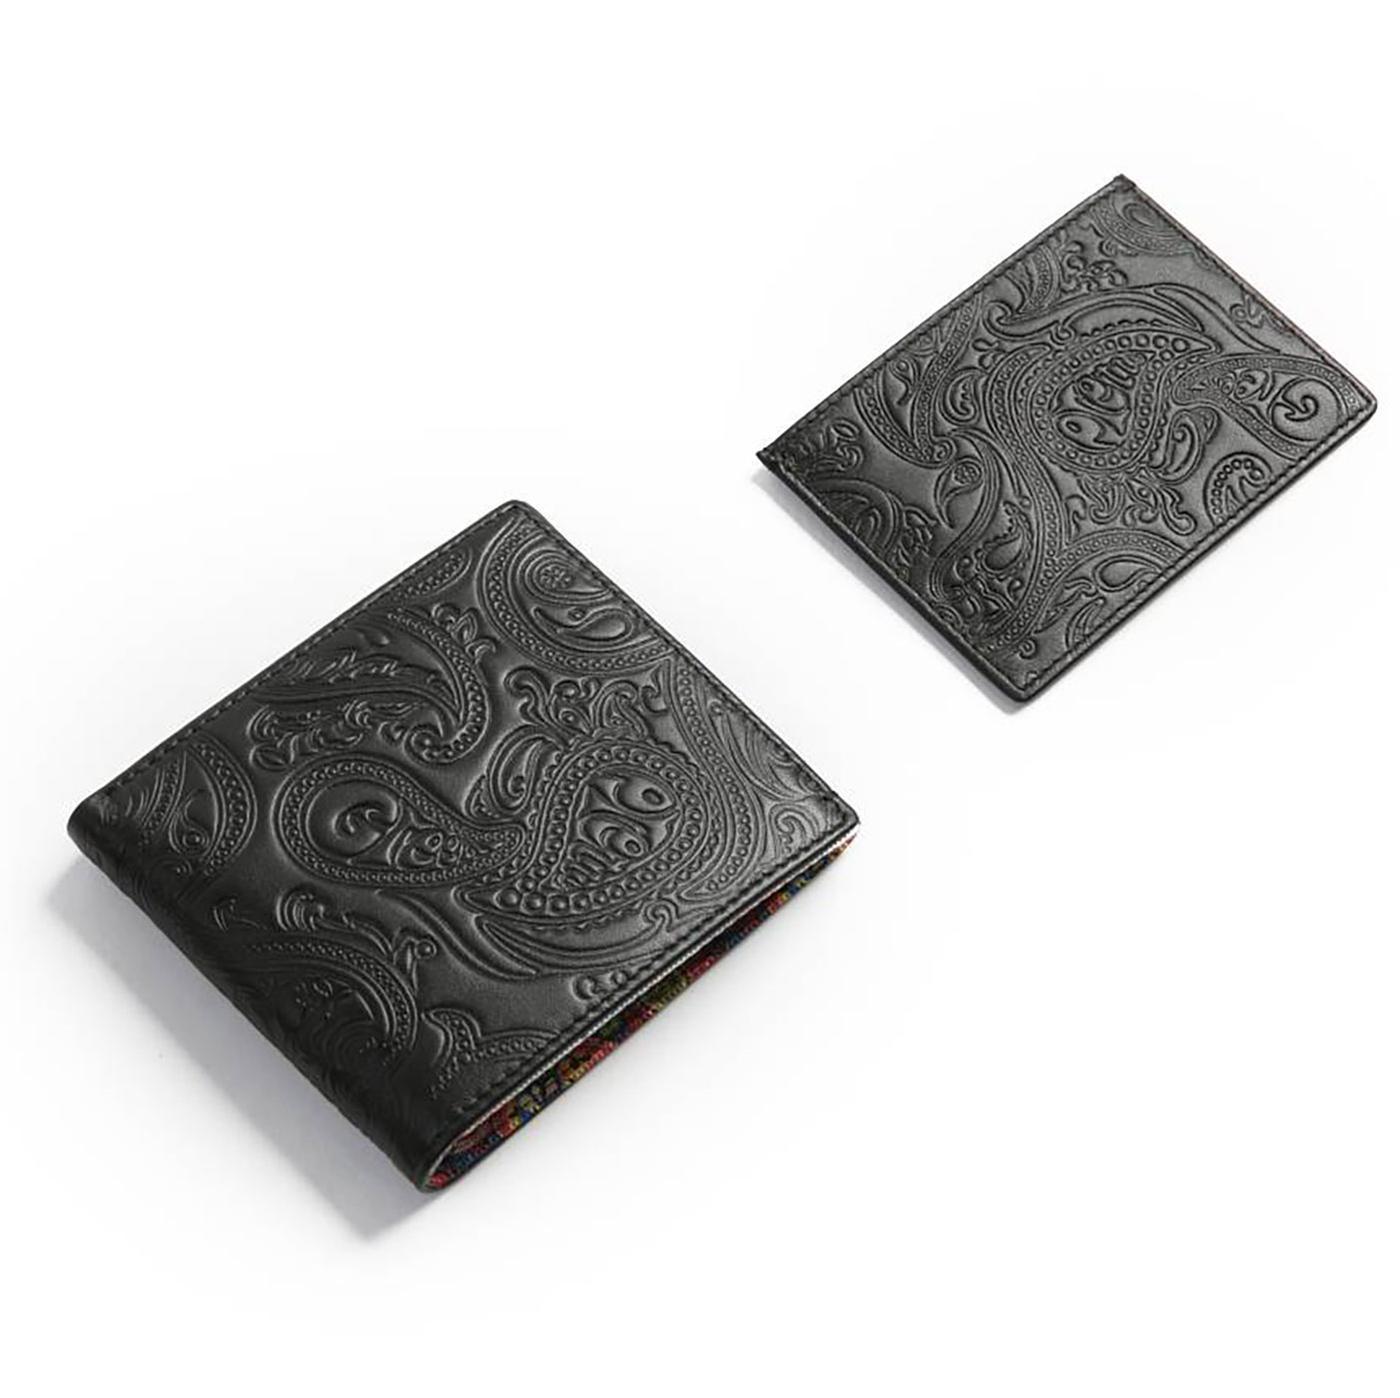 PRETTY GREEN Retro Wallet & Card Holder Gift Set